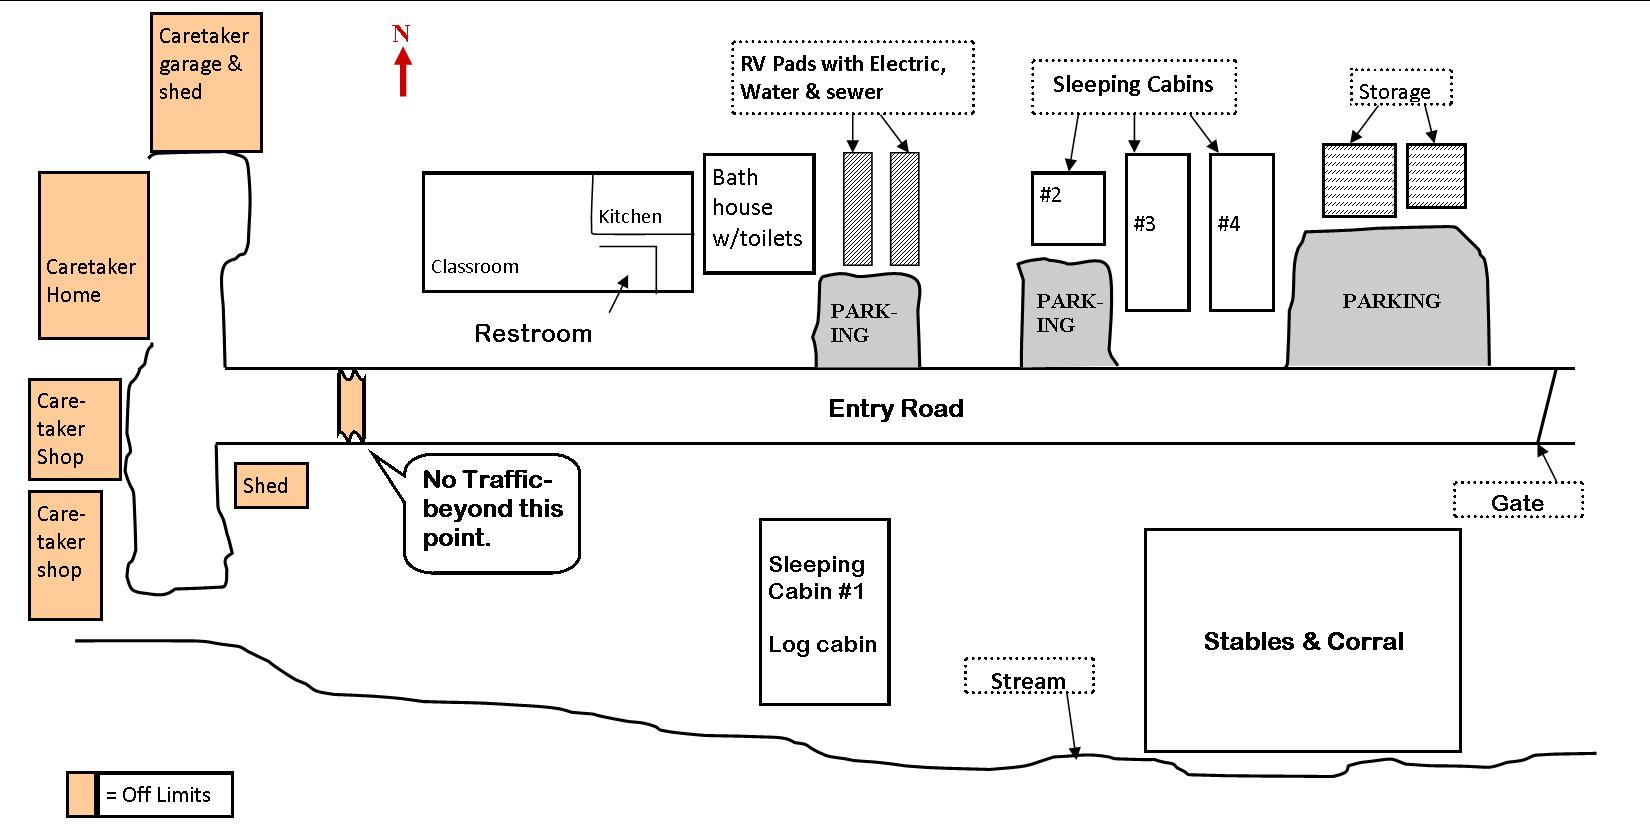 colockum facilities site plan